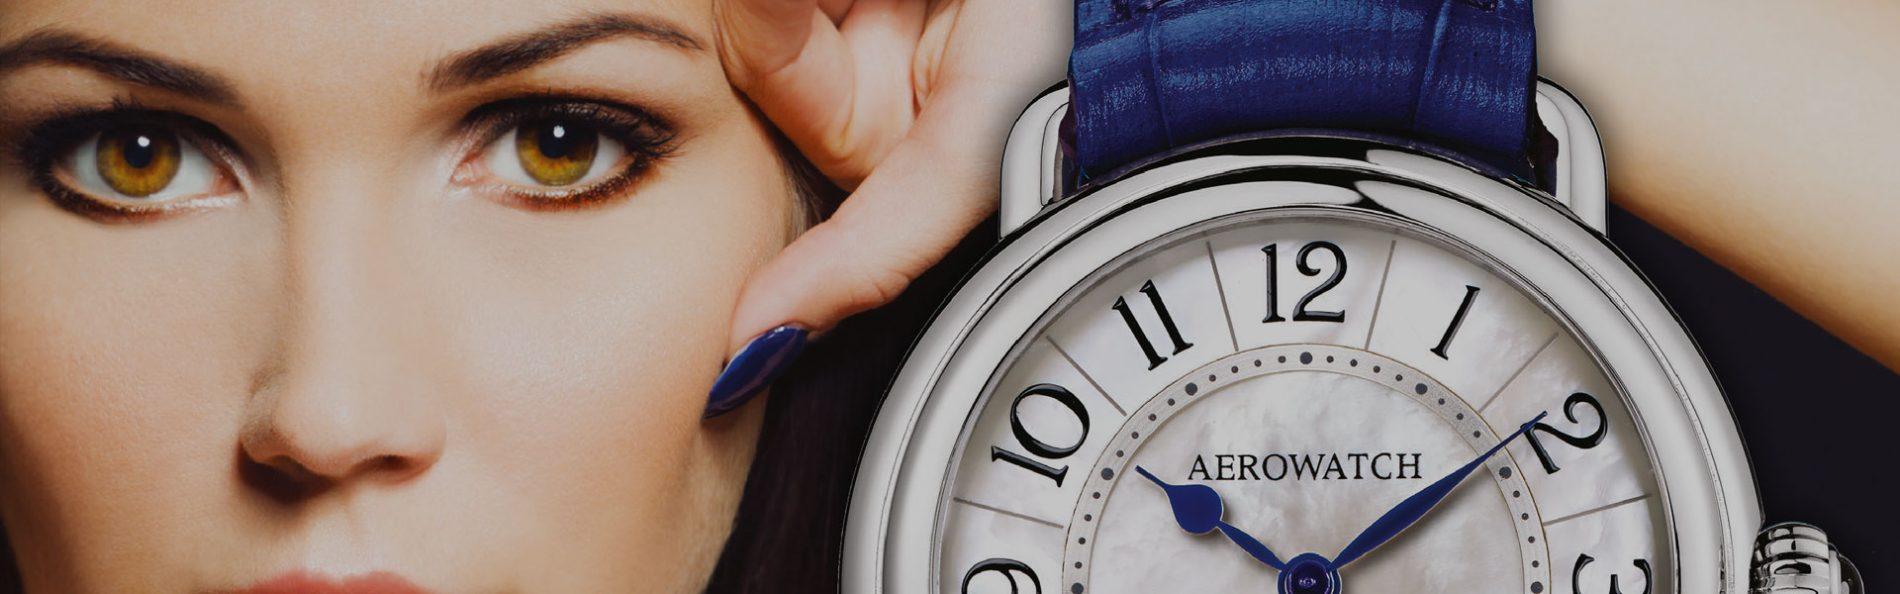 Horloges Aerowatch Slide 2